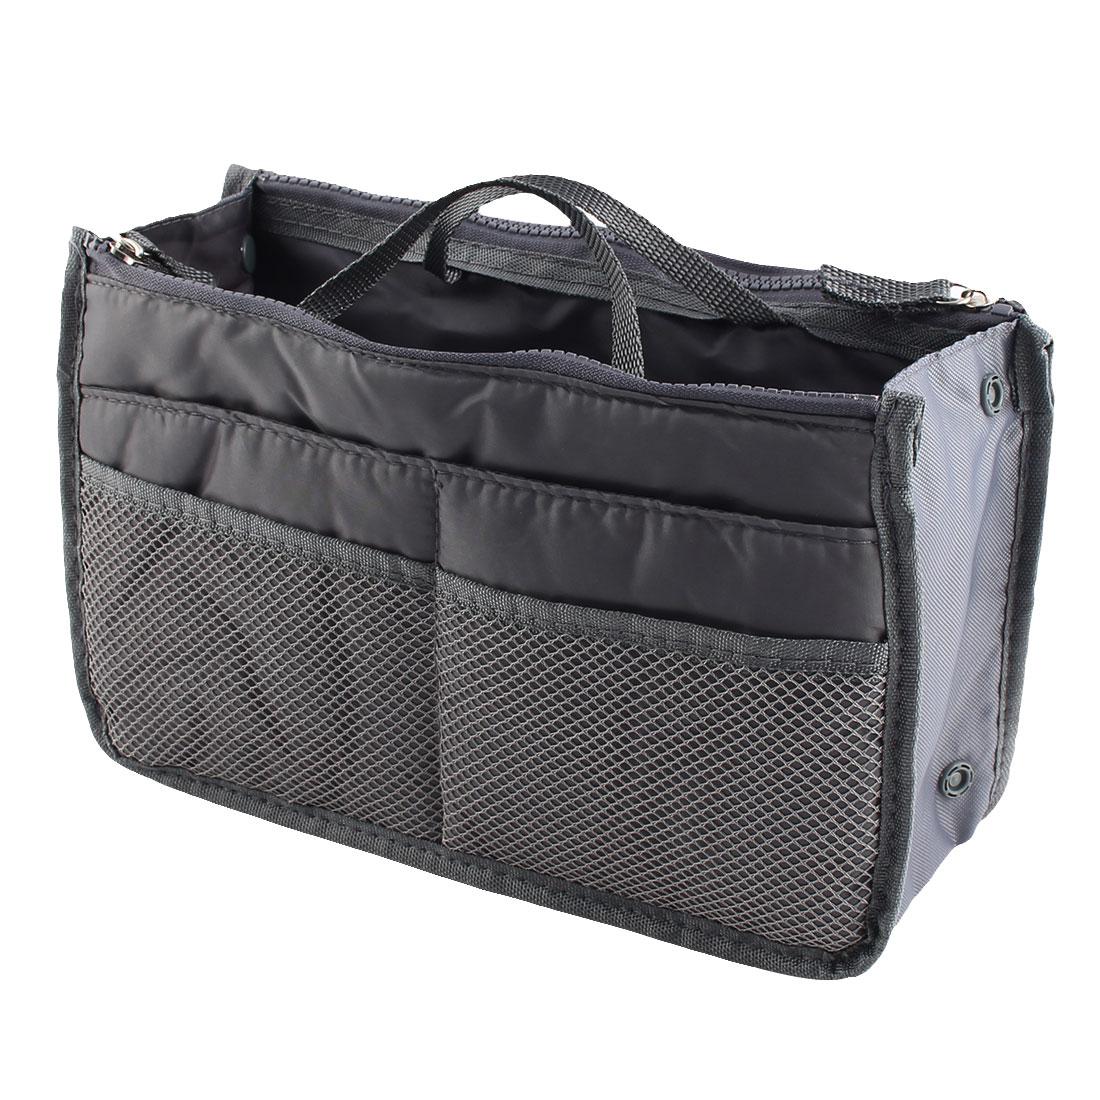 Portable Multi-functional Storage Bag Handbag Organizer Holder Container Gray